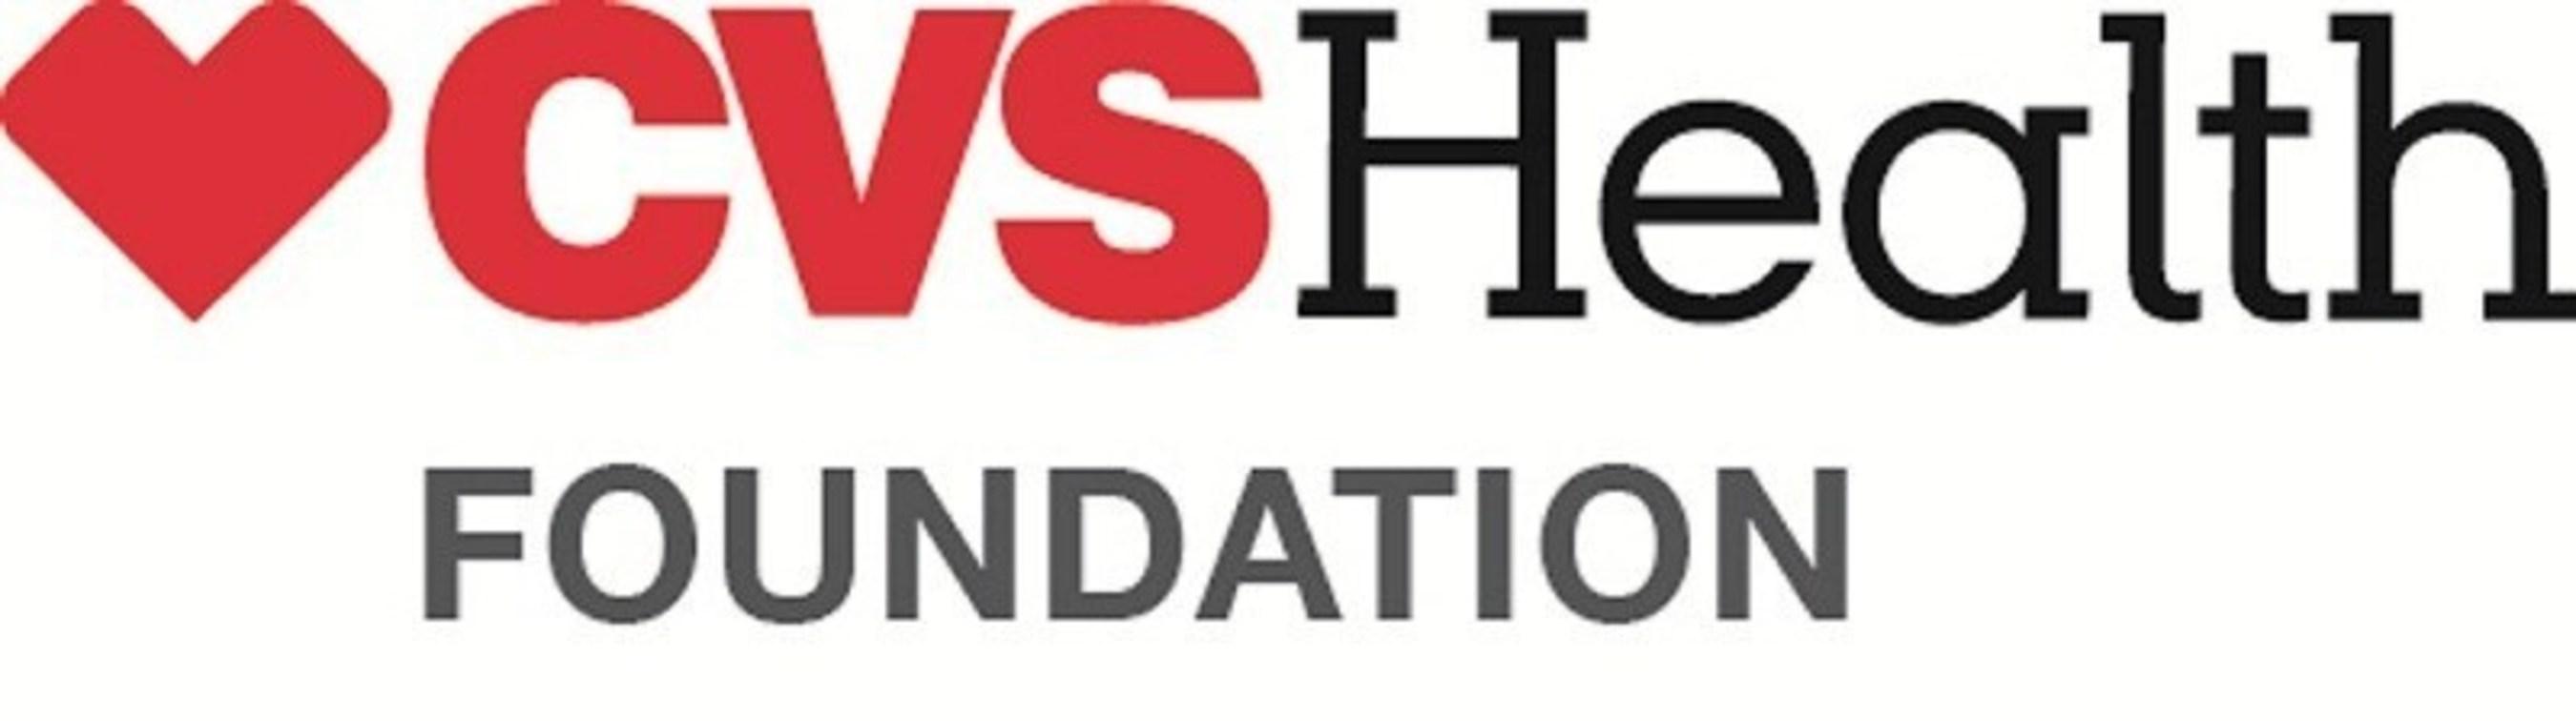 cvs health foundation awards 1 5 million in community health grants